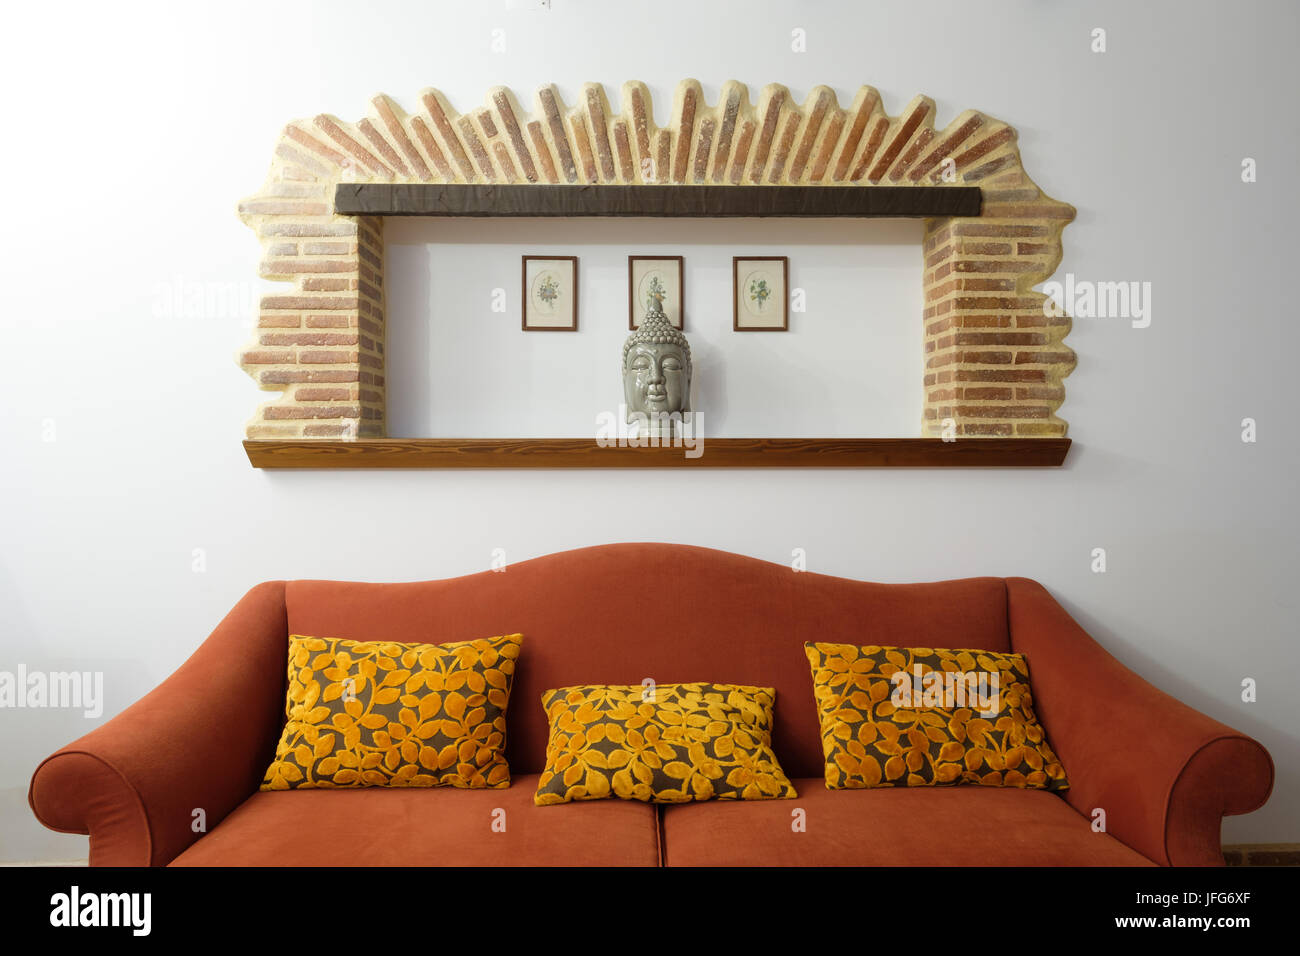 Sofa with three yellow pillows - Stock Image